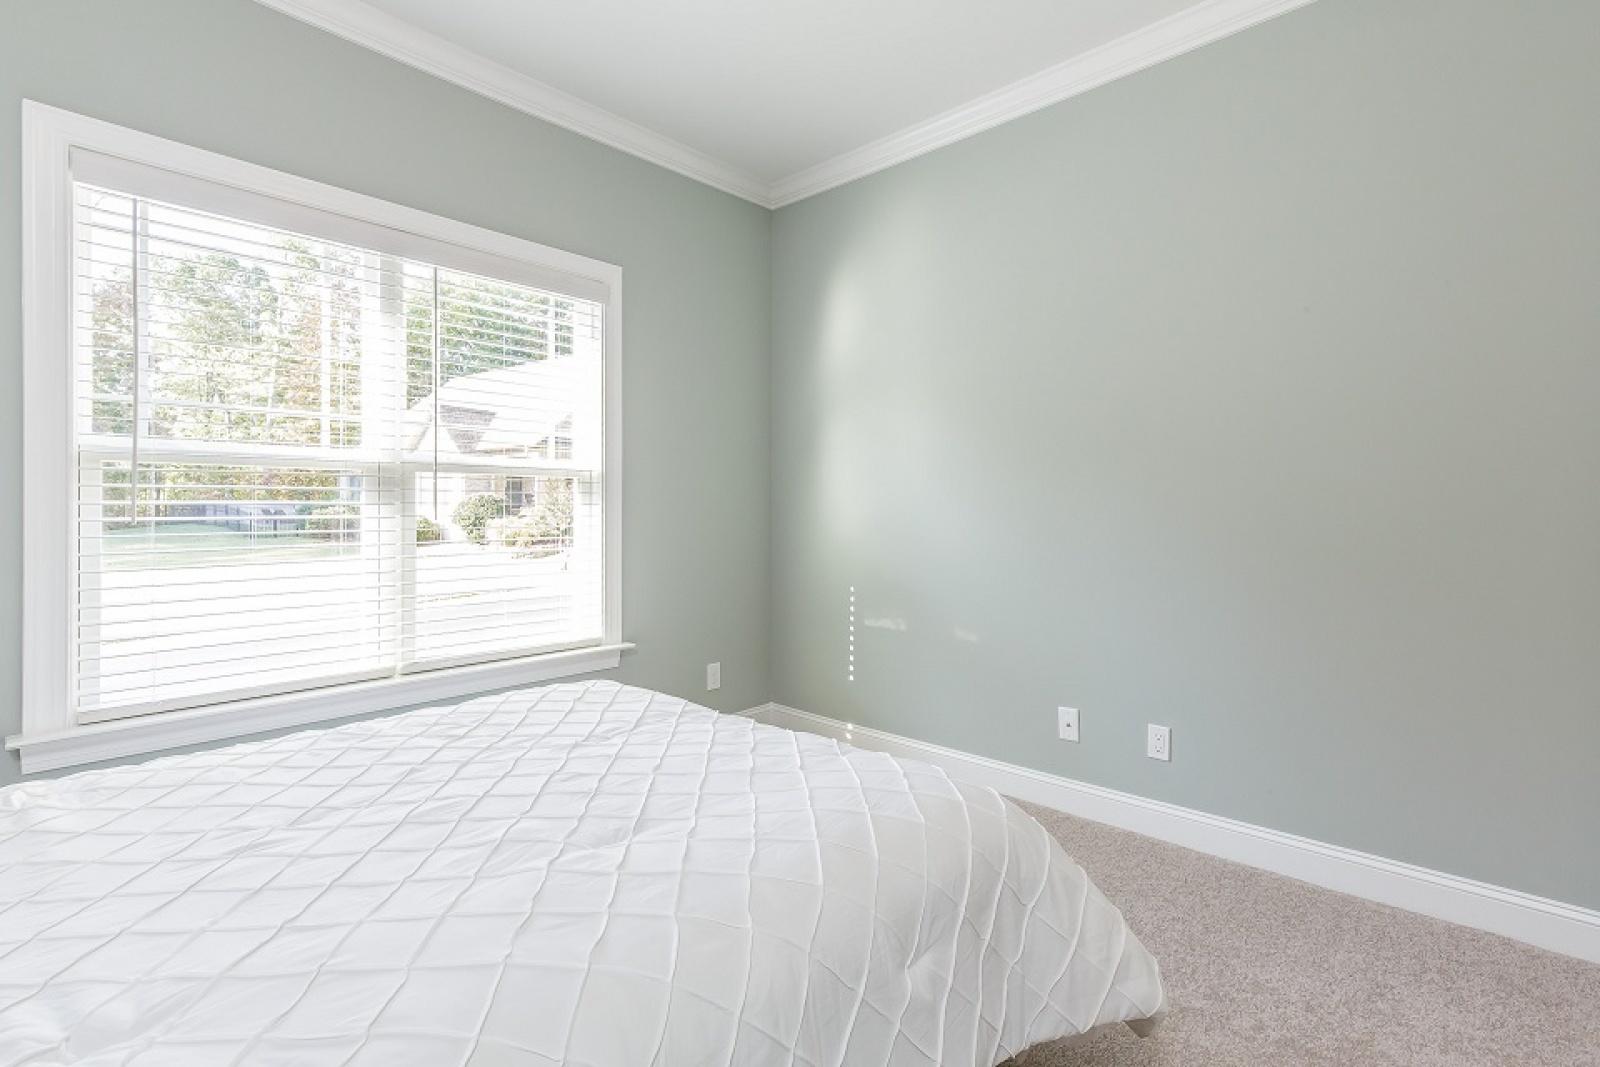 2319 W Grey Gables Dr., Burlington, North Carolina 27215, 2 Bedrooms Bedrooms, 6 Rooms Rooms,2 BathroomsBathrooms,Grey Gables,For Sale,Tryon,W Grey Gables,1026